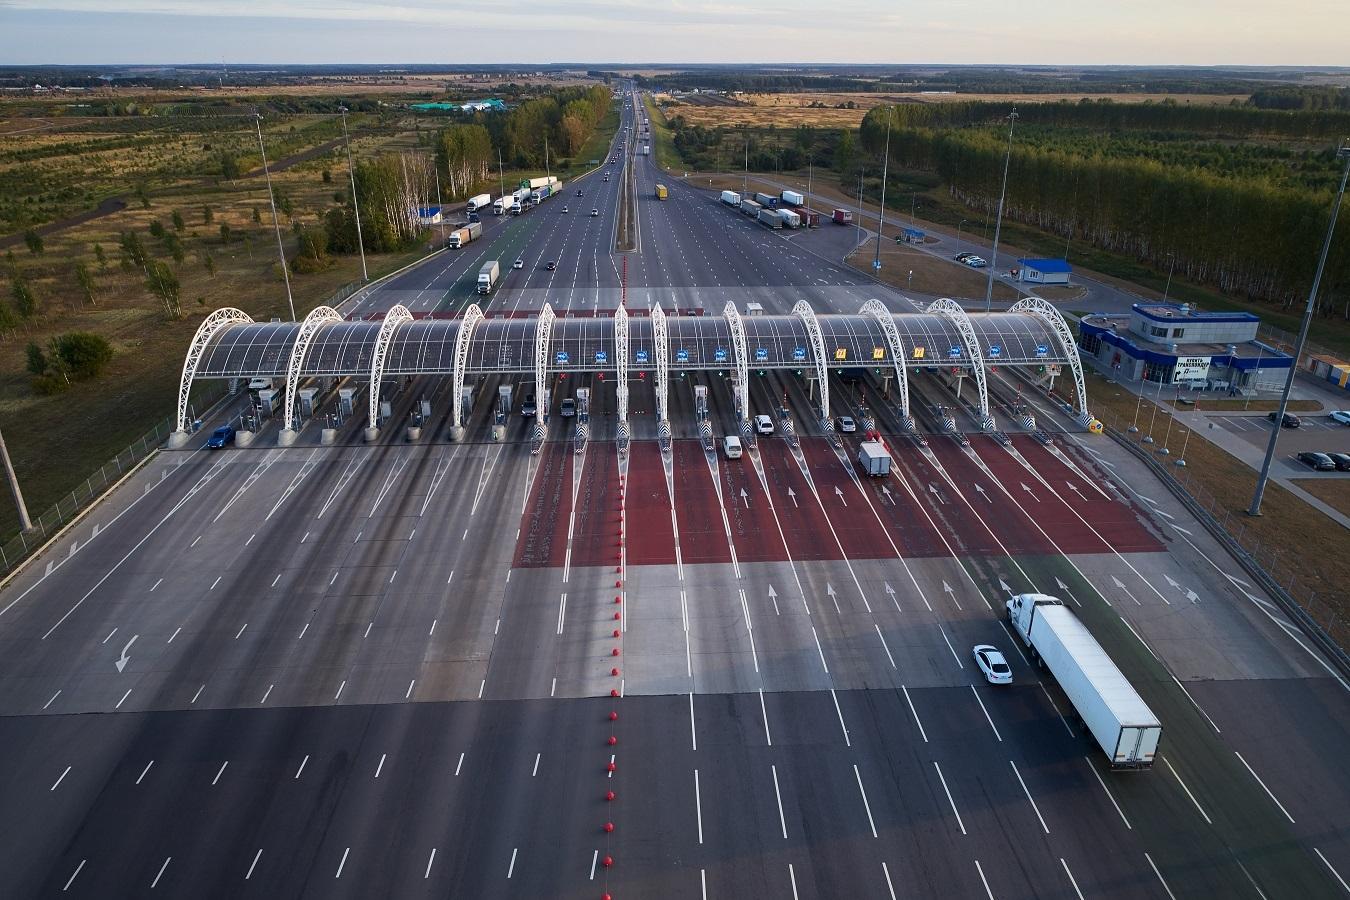 Иностранцев хотят обязать платить за проезд по украинским дорогам 1